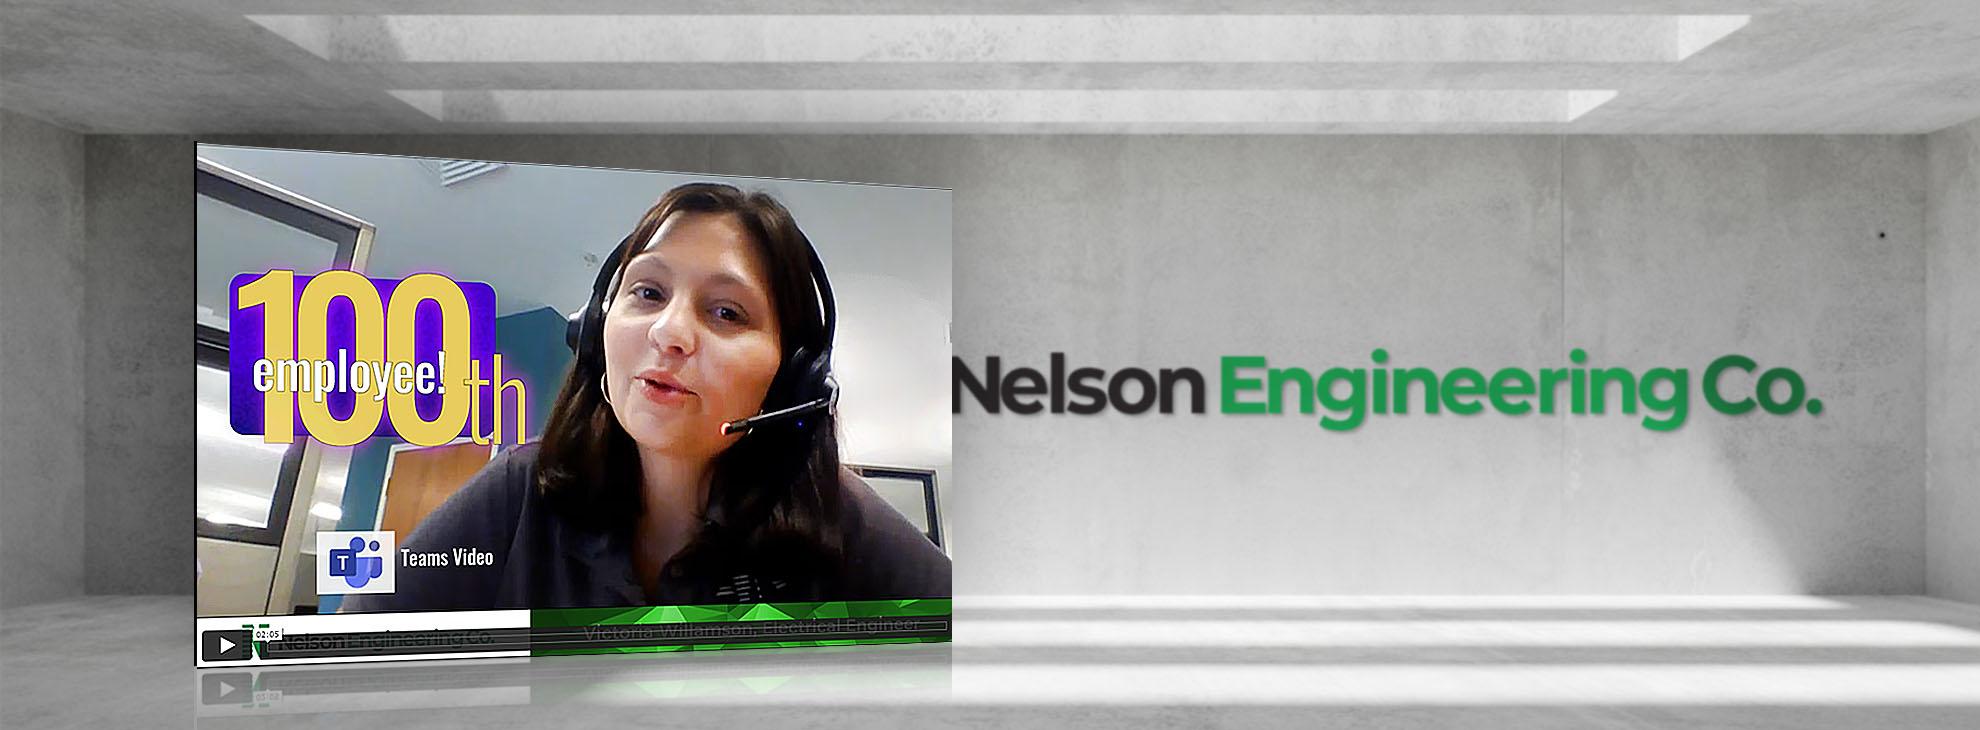 Nelson Engineering 100th Employee Victoria Williamson